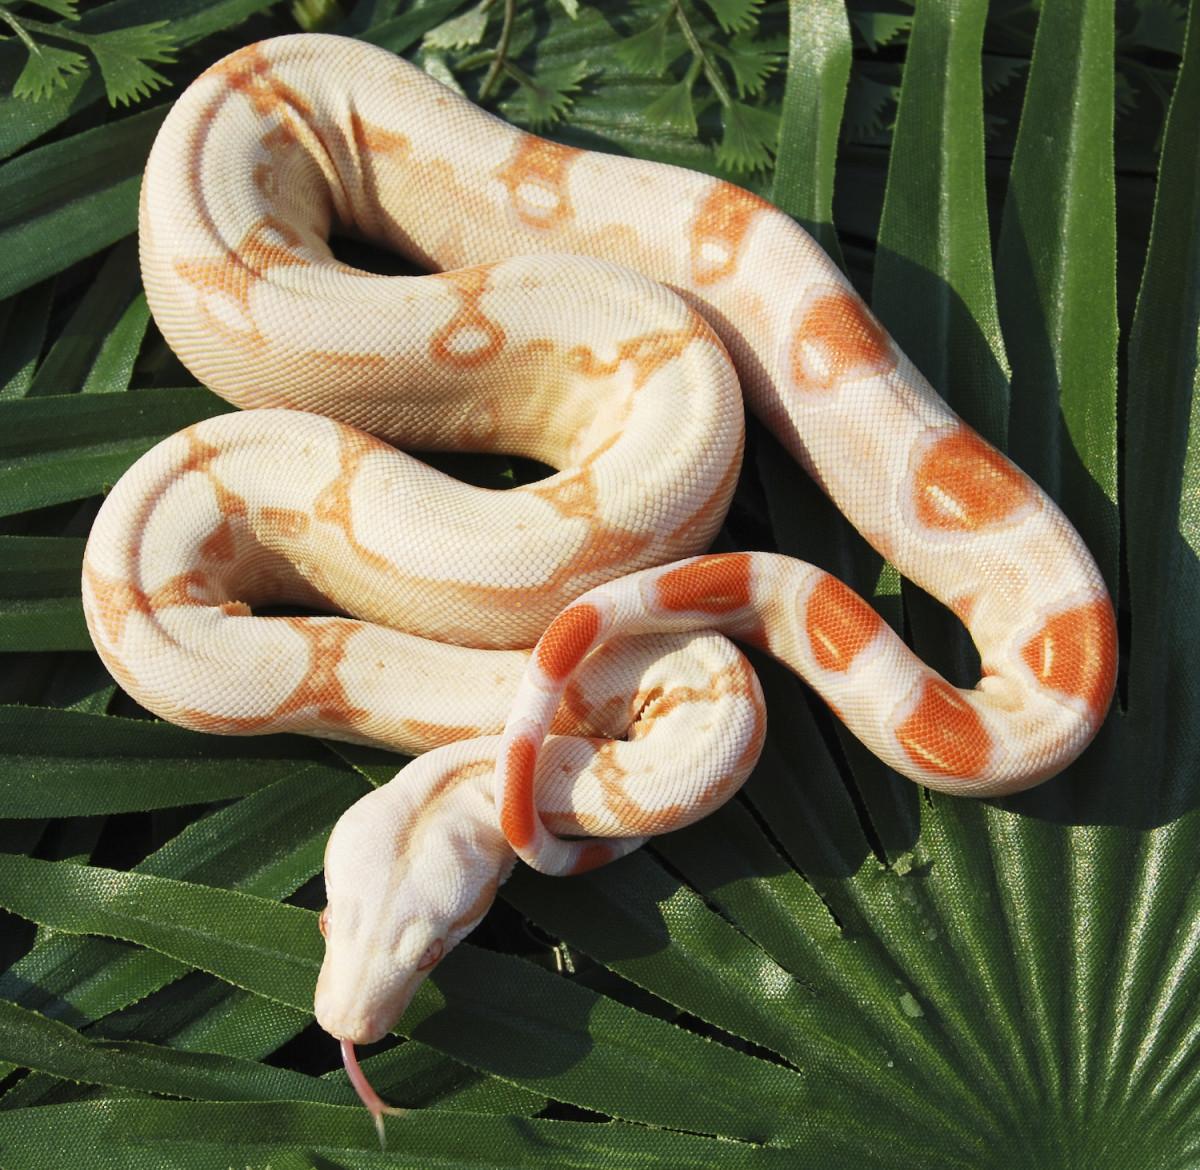 Albino red-tailed boa constrictor